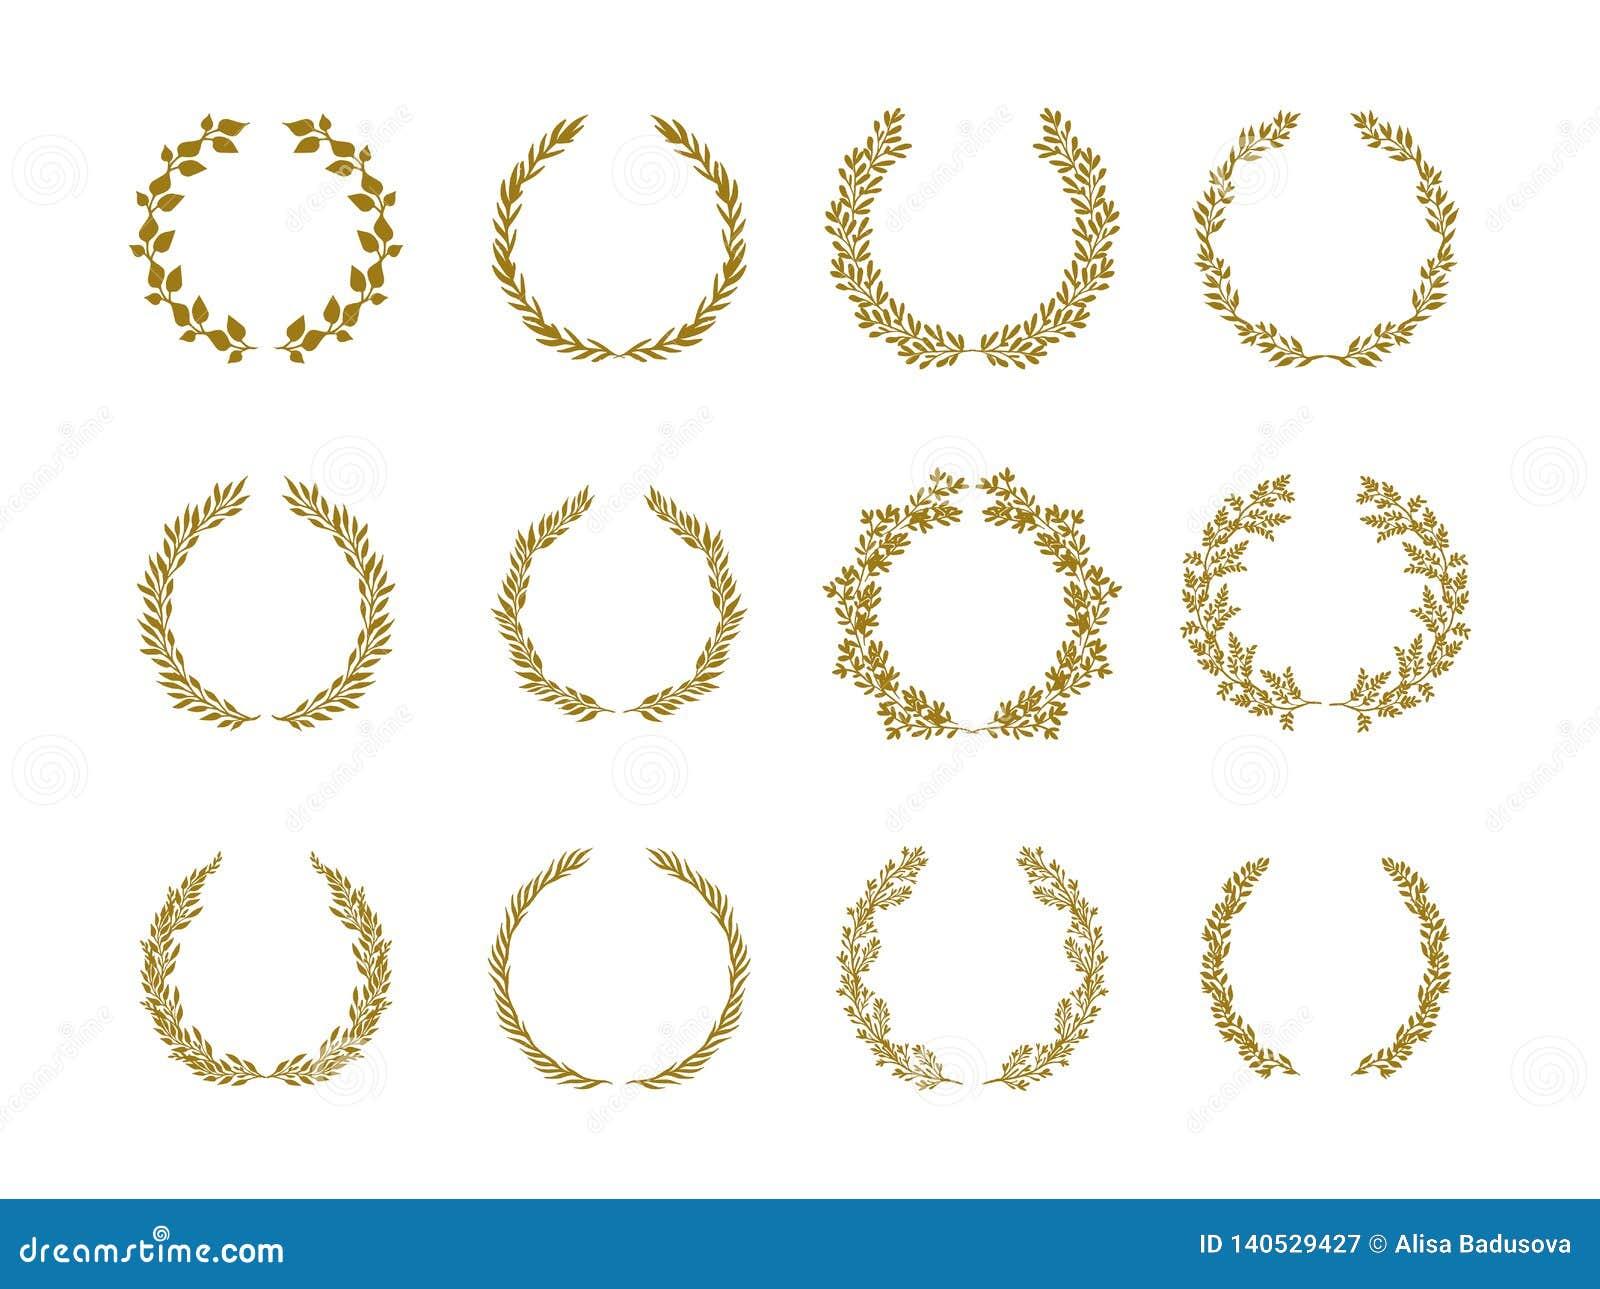 Gold laurel foliage wreath vector illustration set on white background